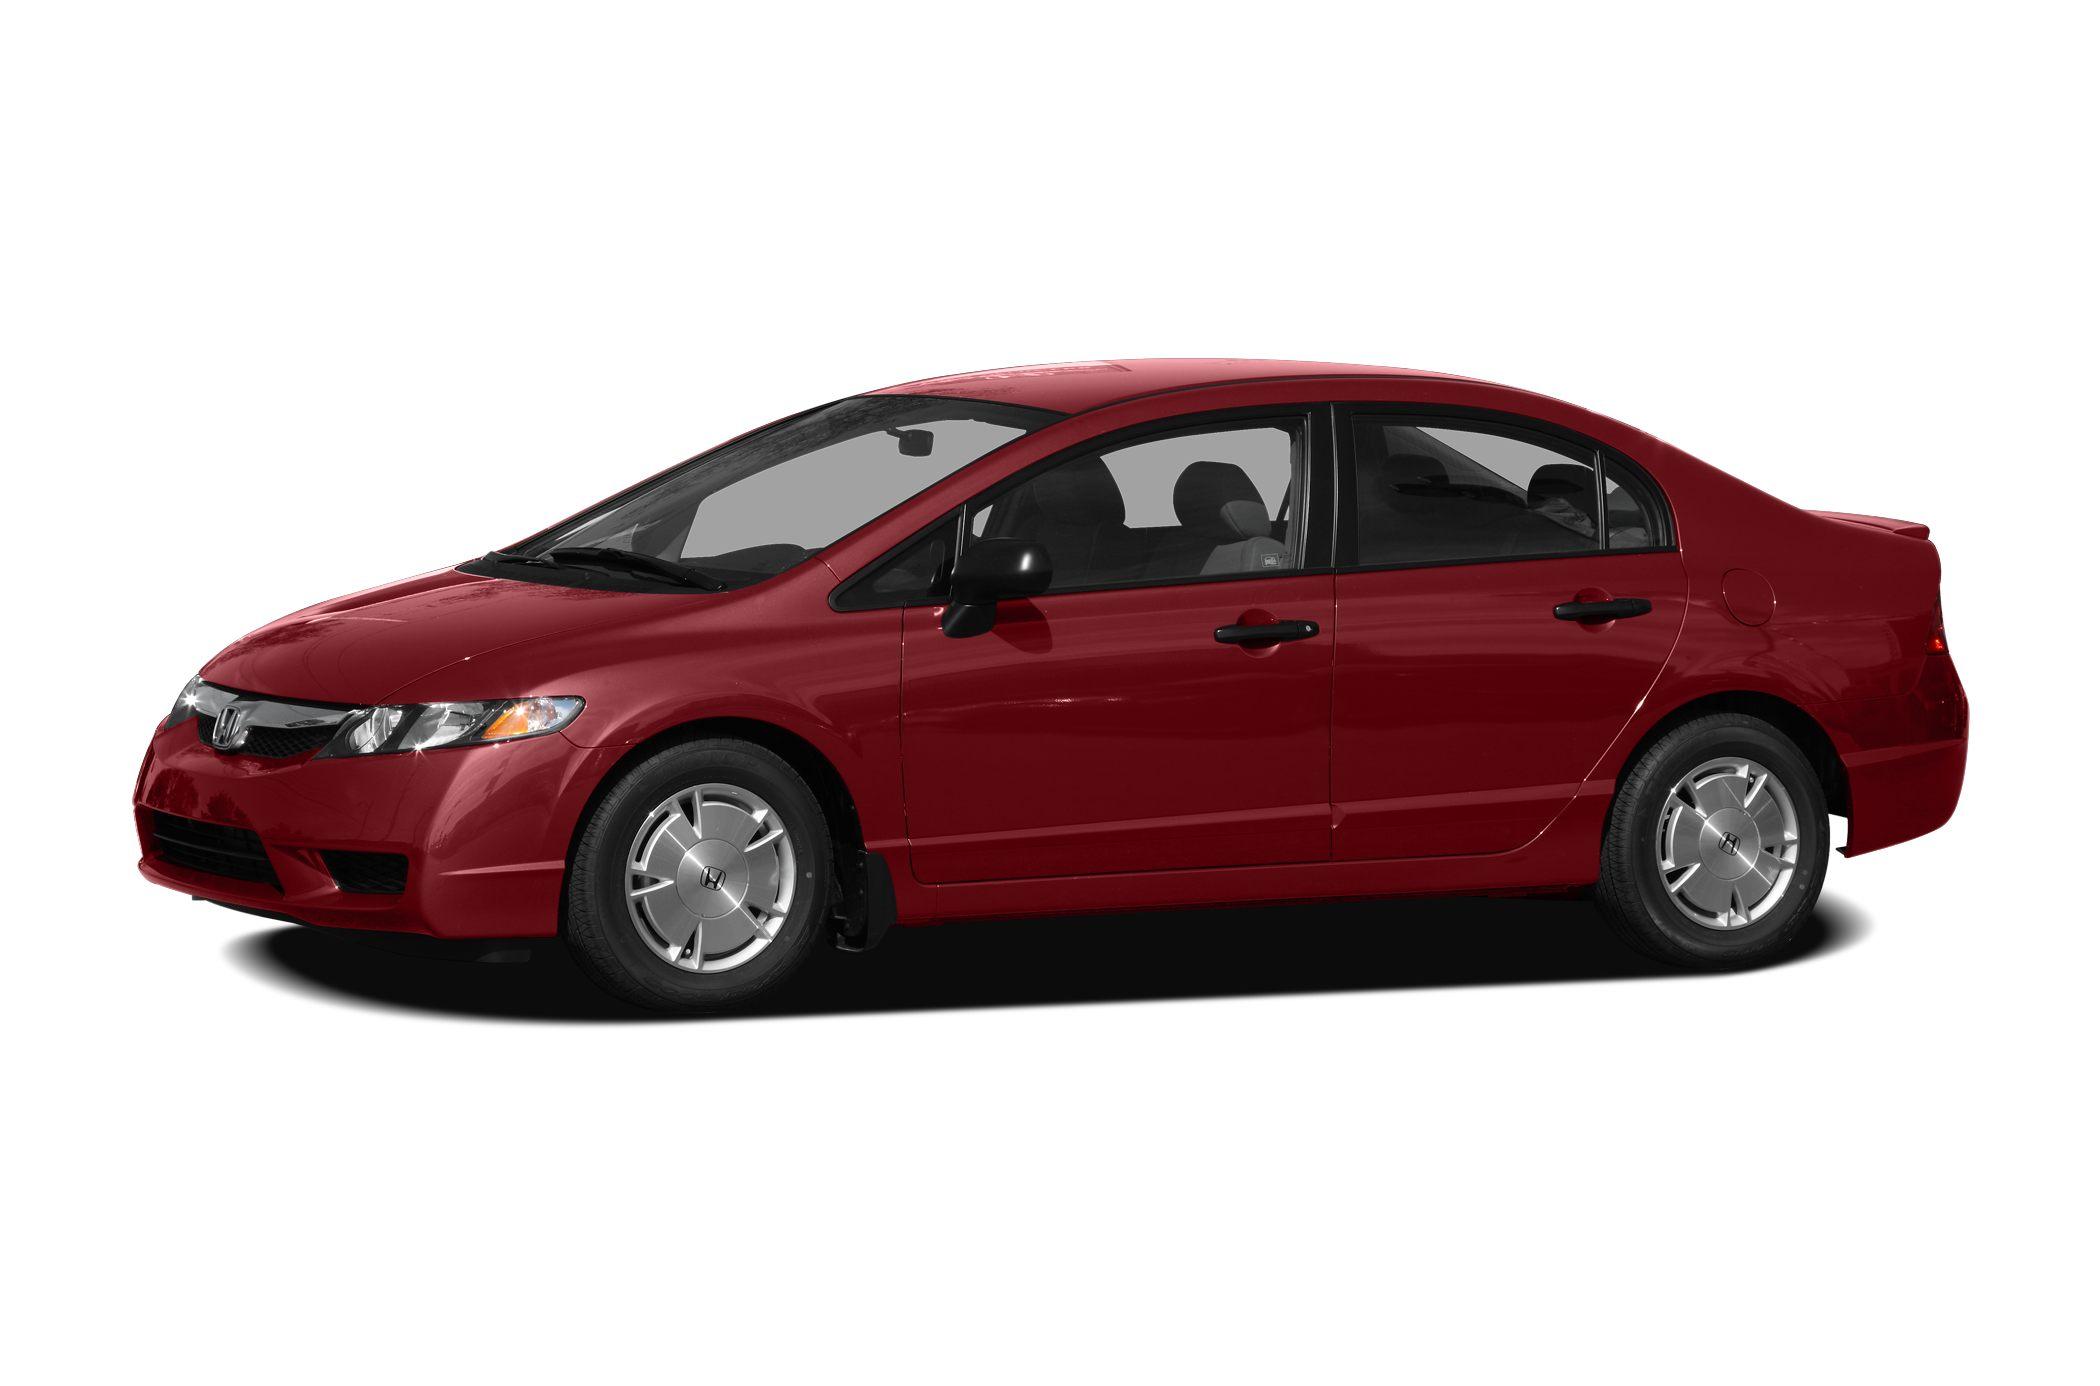 honda for civic autogo used g sale dx en cars